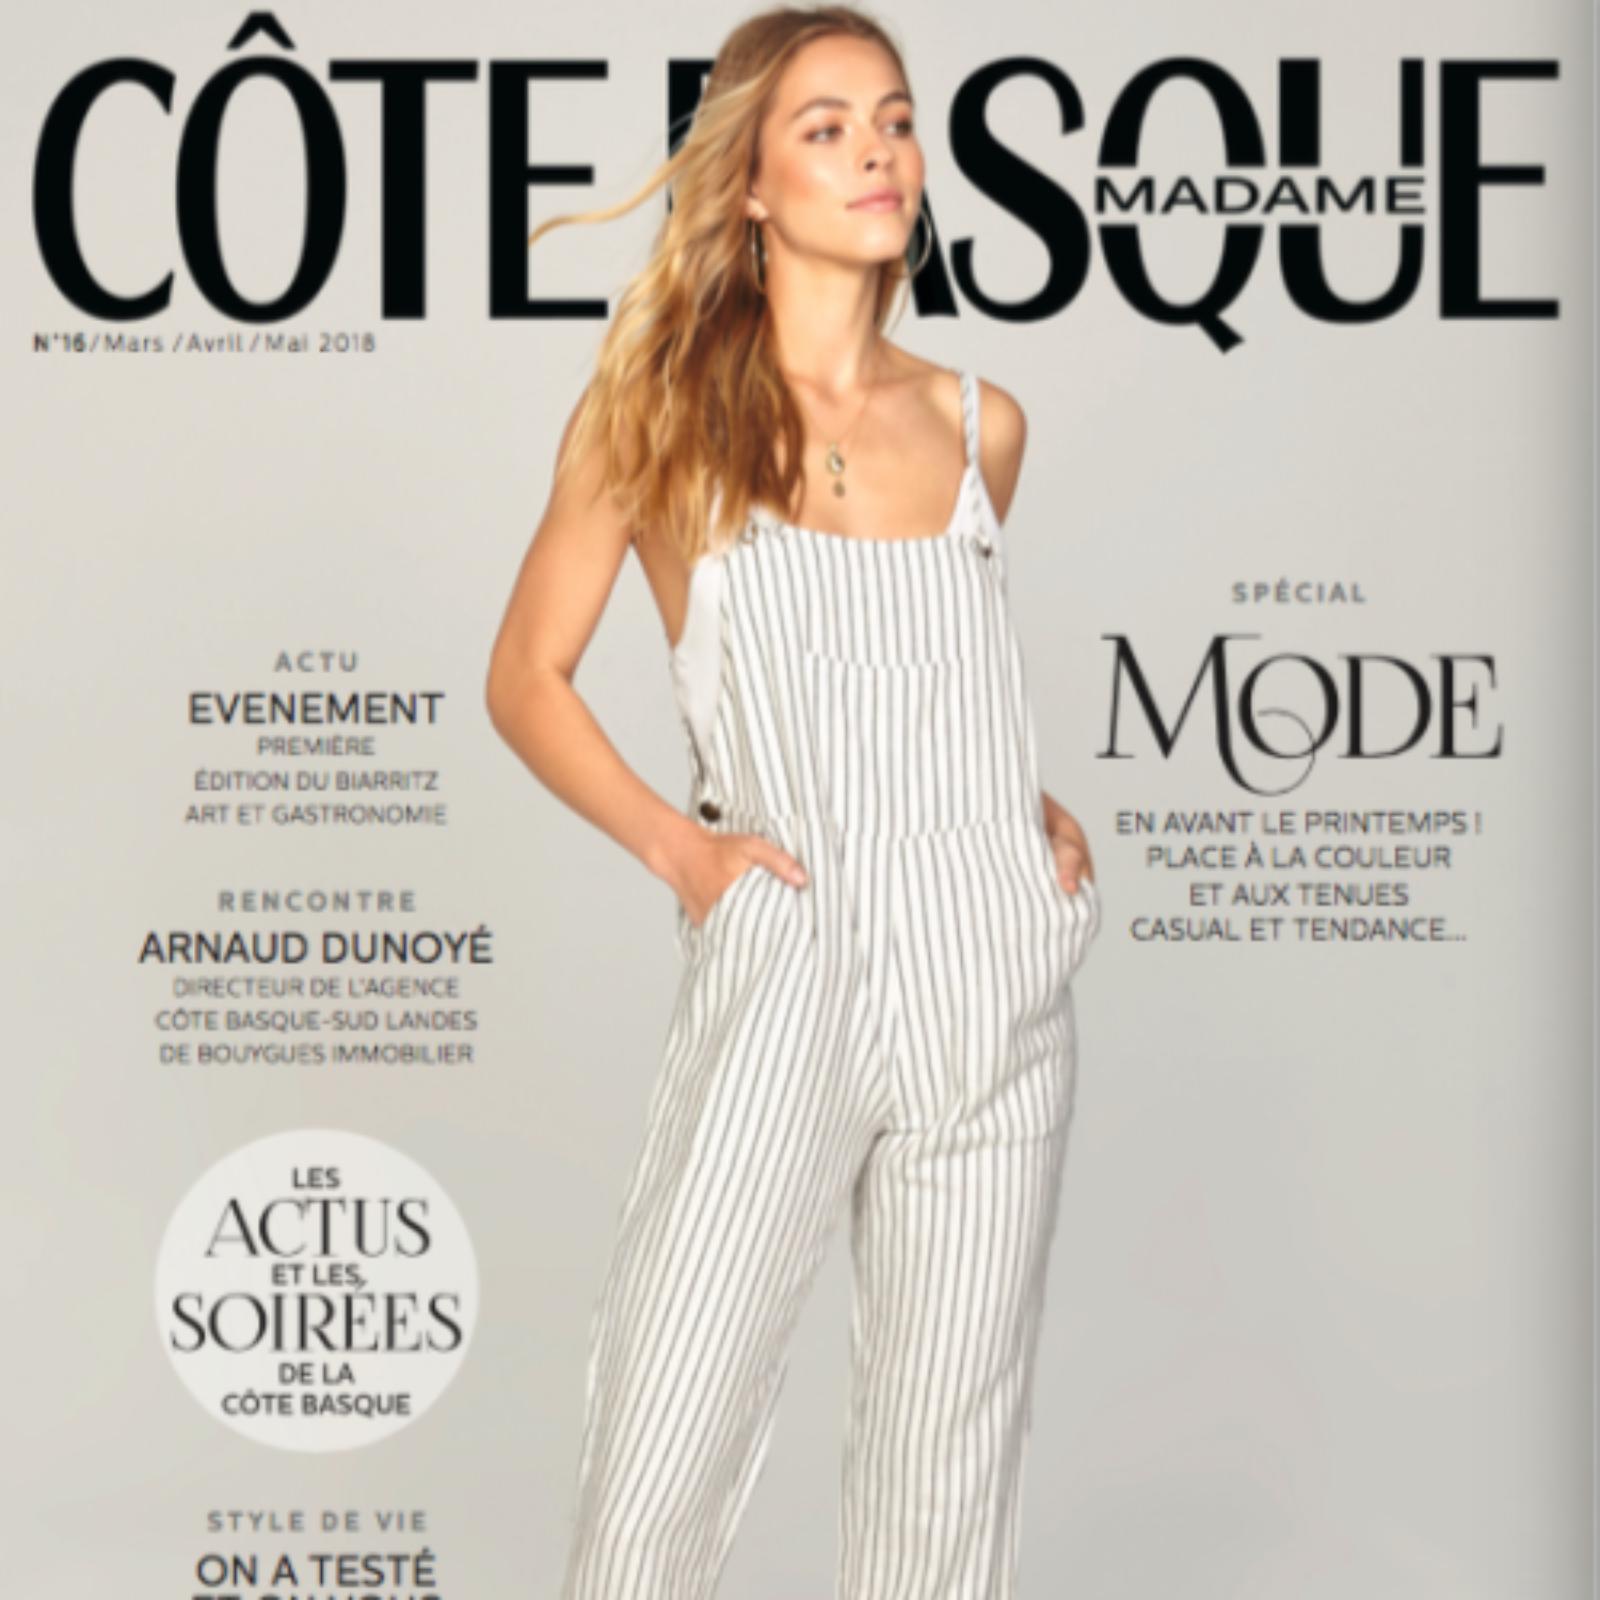 couverture magazine cote basque madame avril-mai 2018